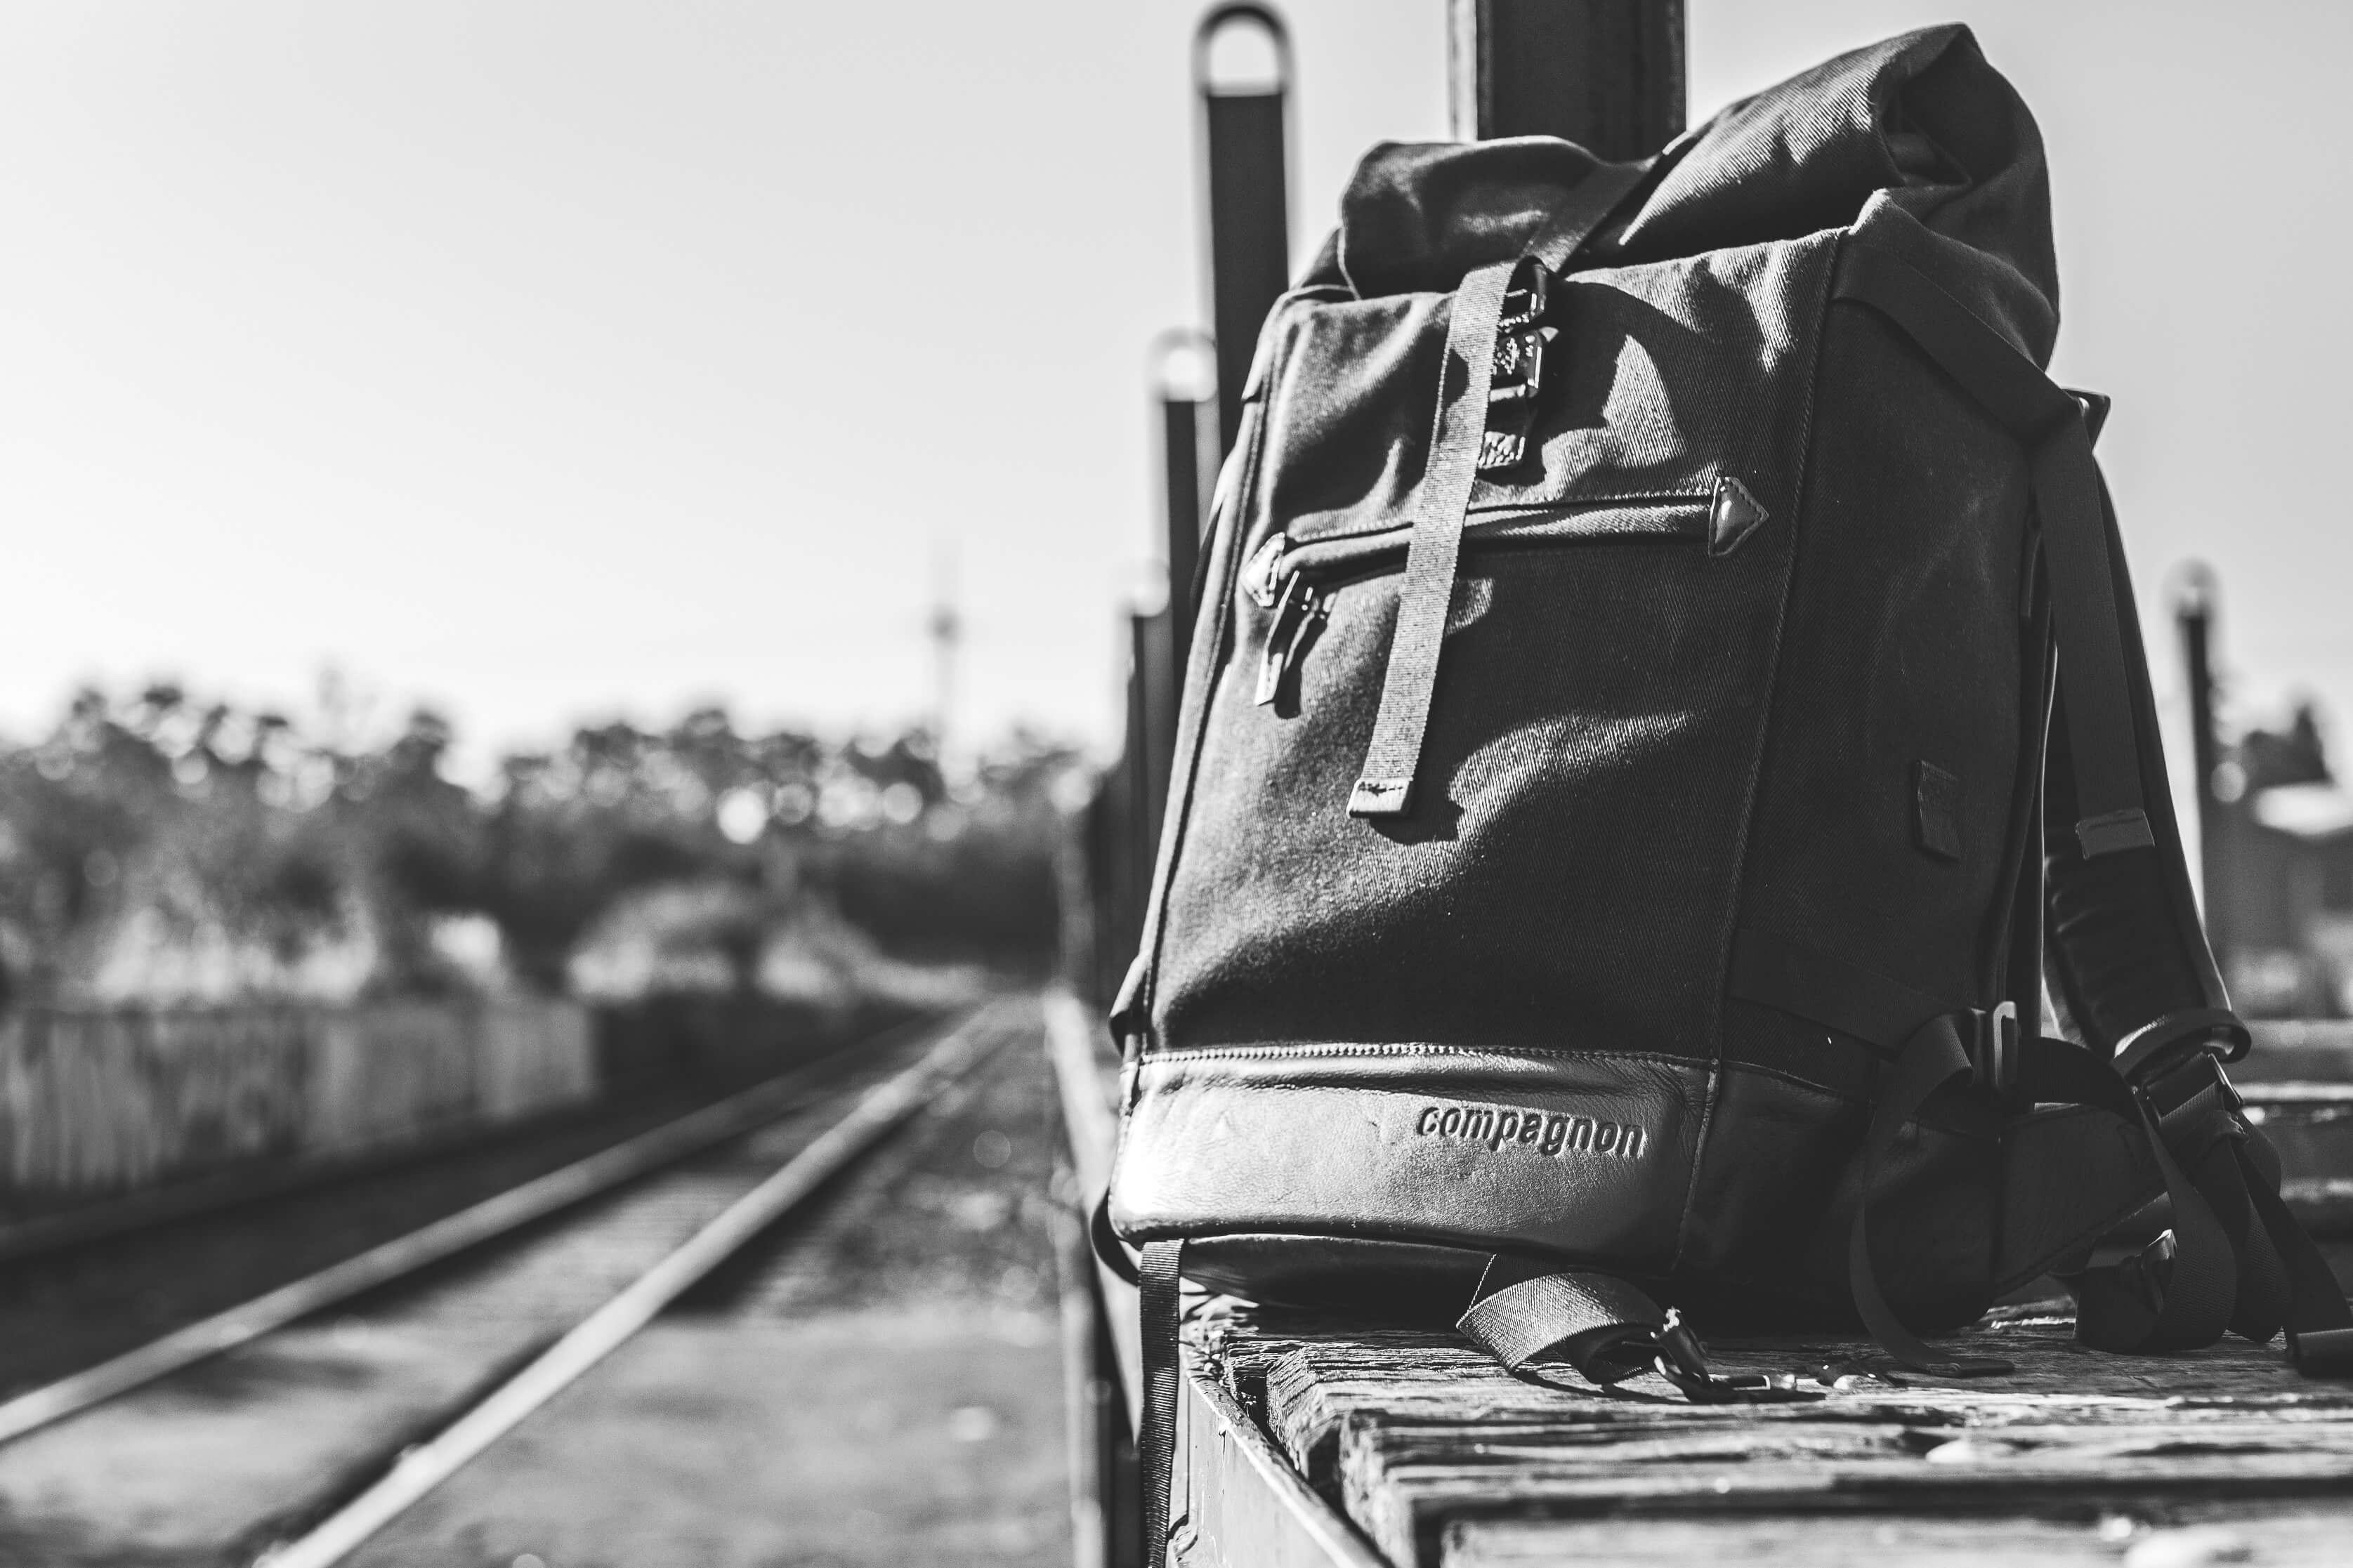 compagnon-camerabag-backpack2-daniel-wanders-vinyl5